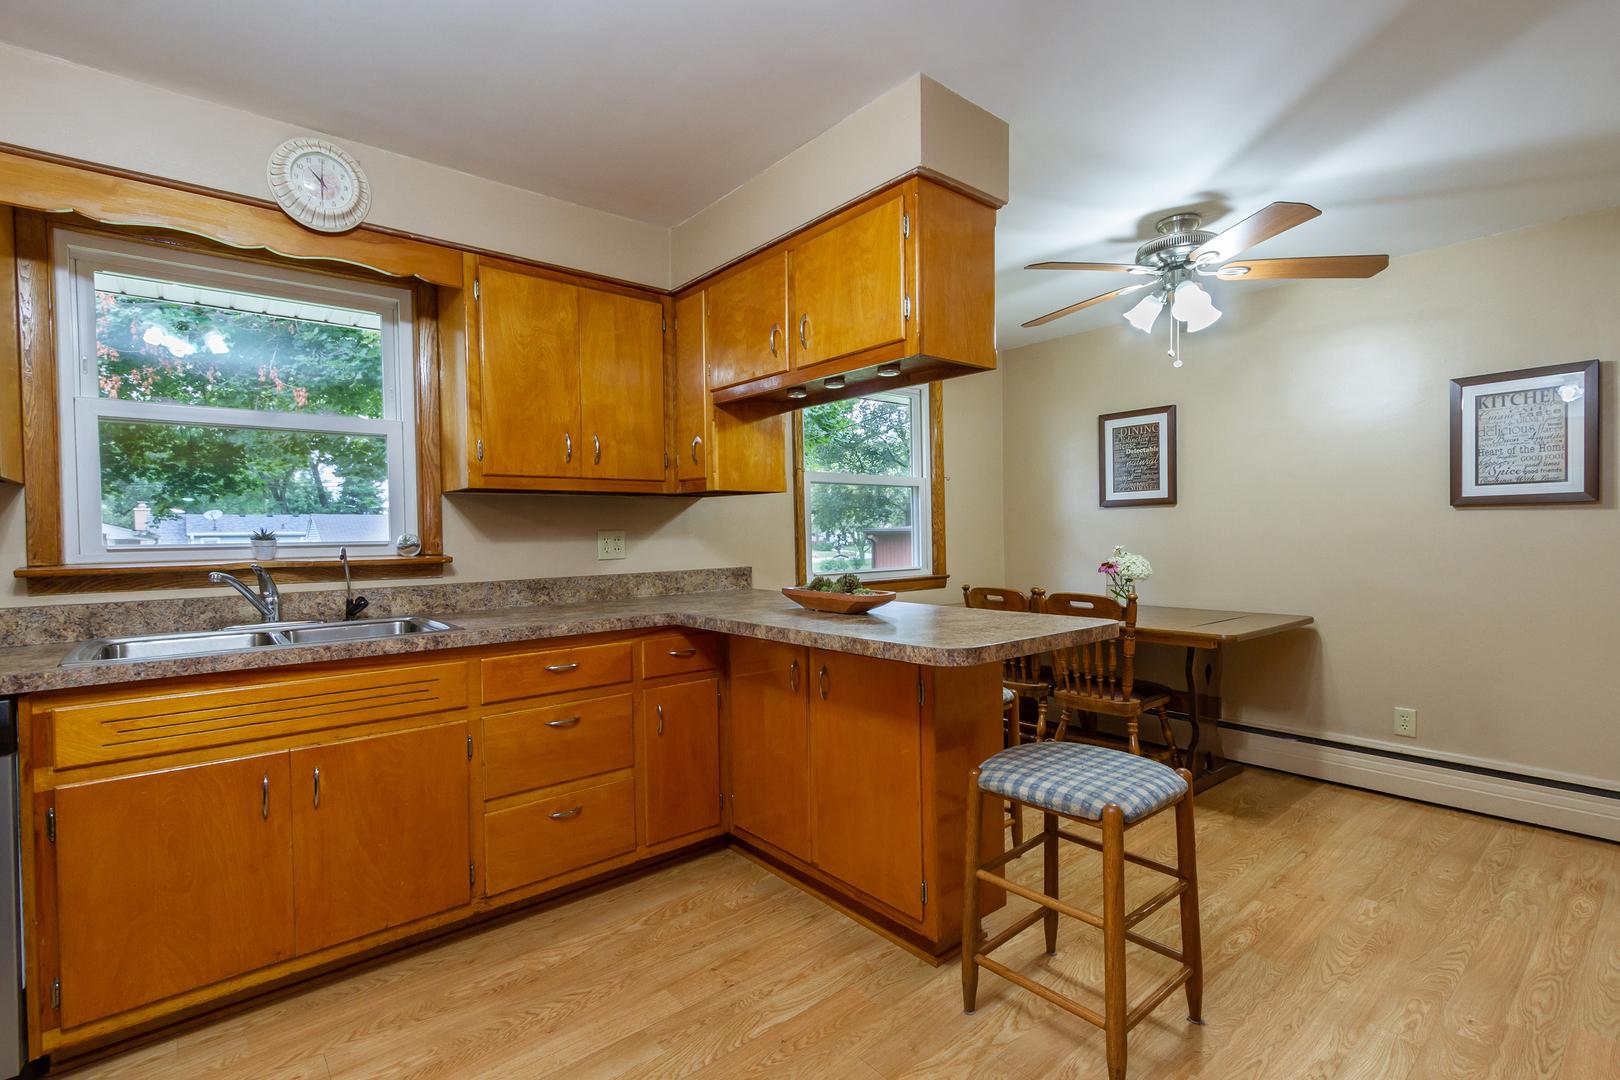 356 East Jackson, Hampshire, Illinois, 60140